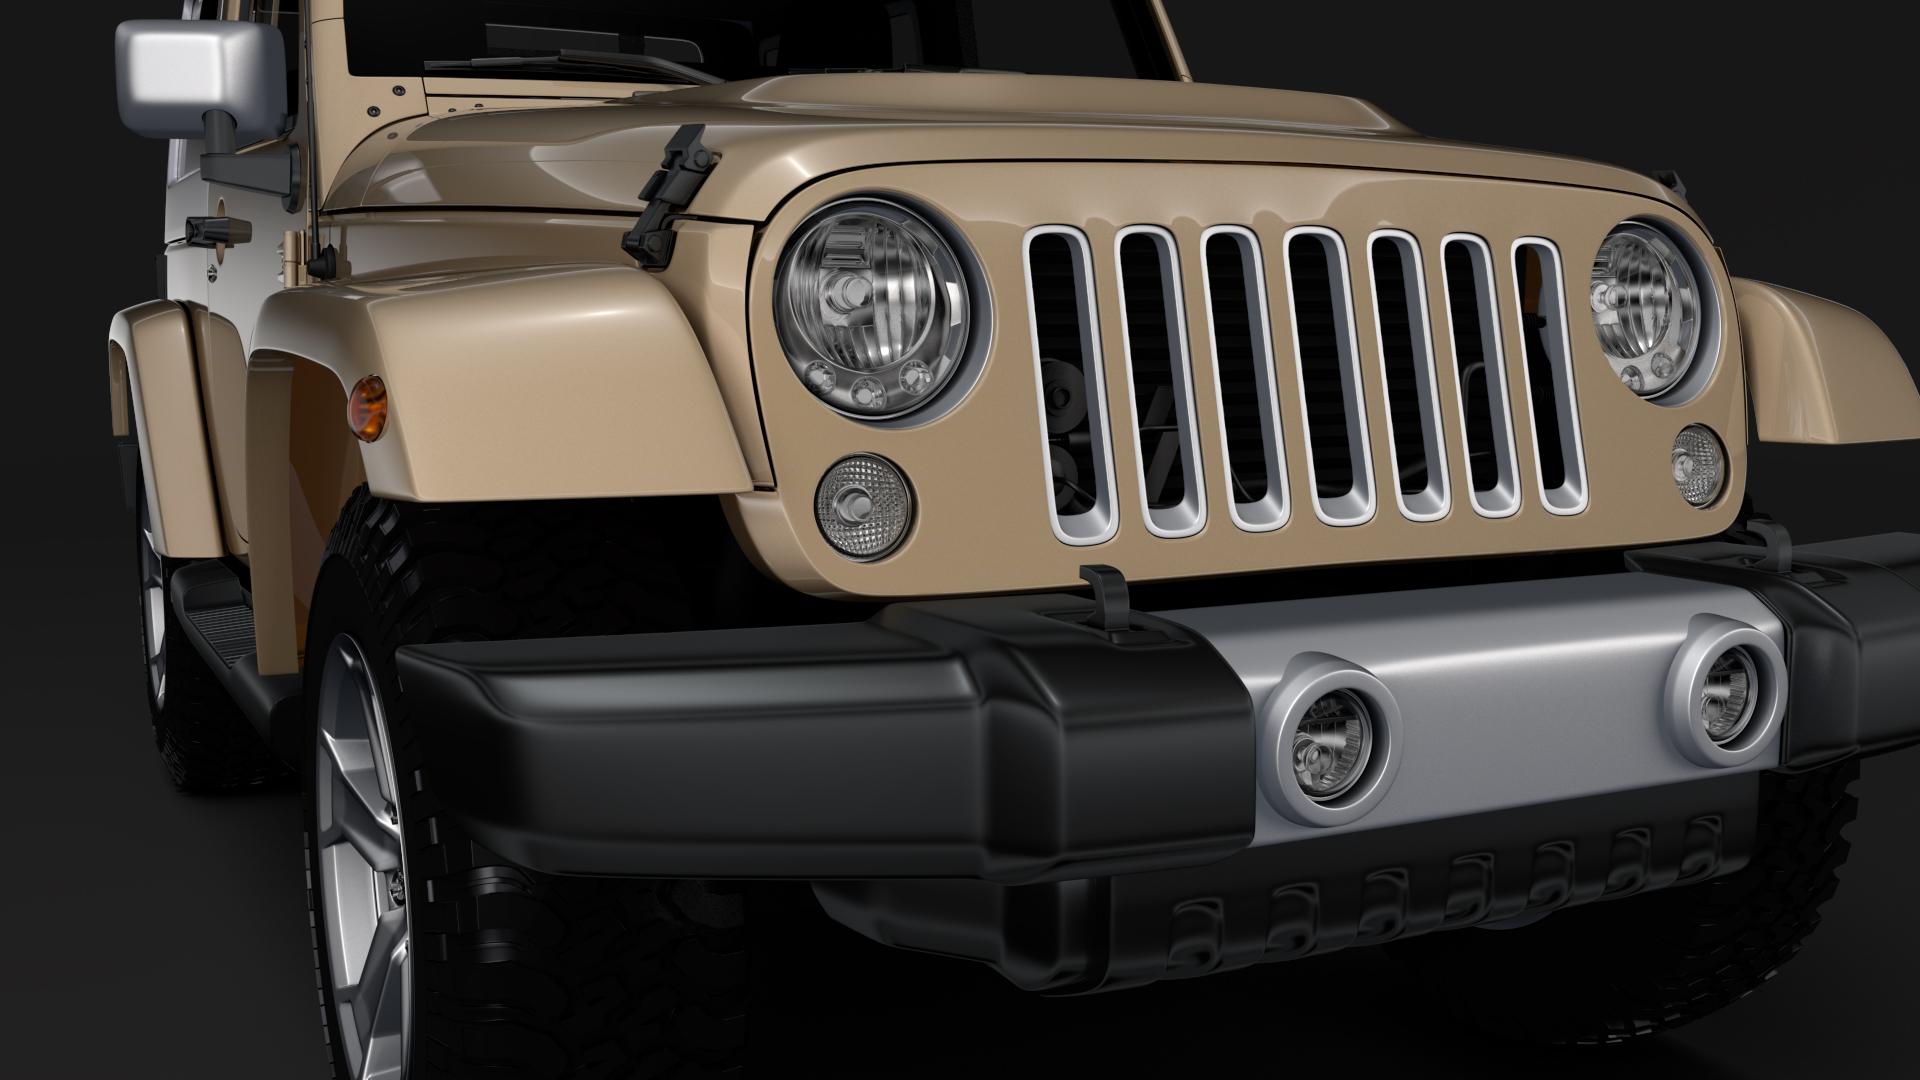 jeep wrangler chief jk 2017 3d model max fbx c4d lwo ma mb hrc xsi obj 276873